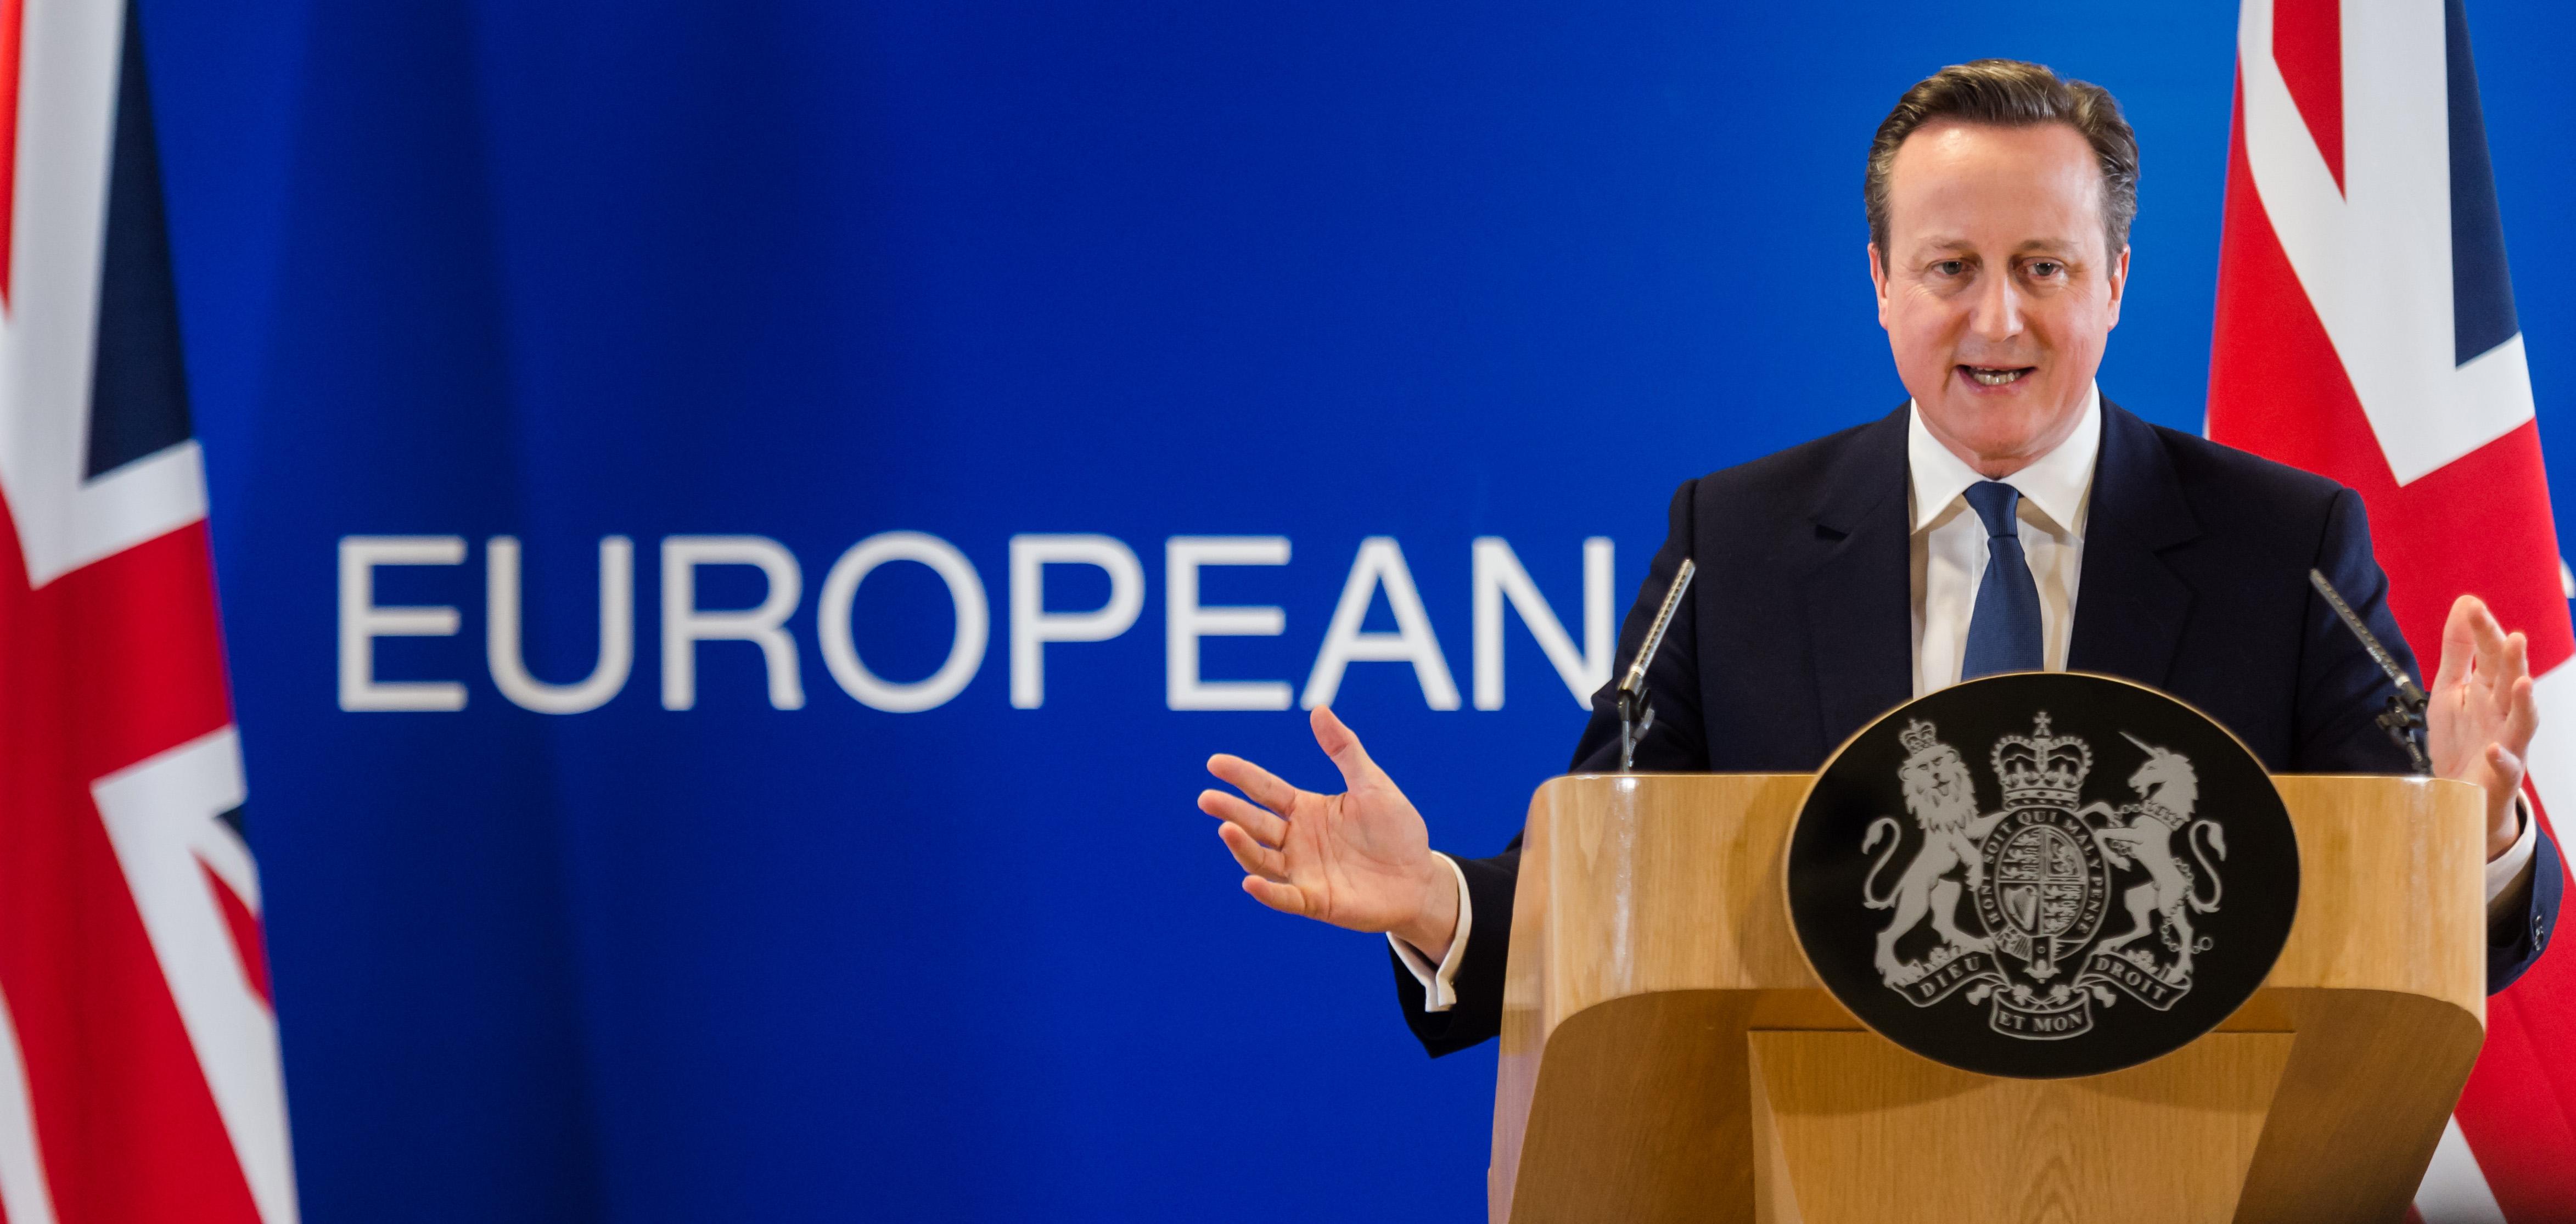 David Cameron, primer ministro de Reino Unido